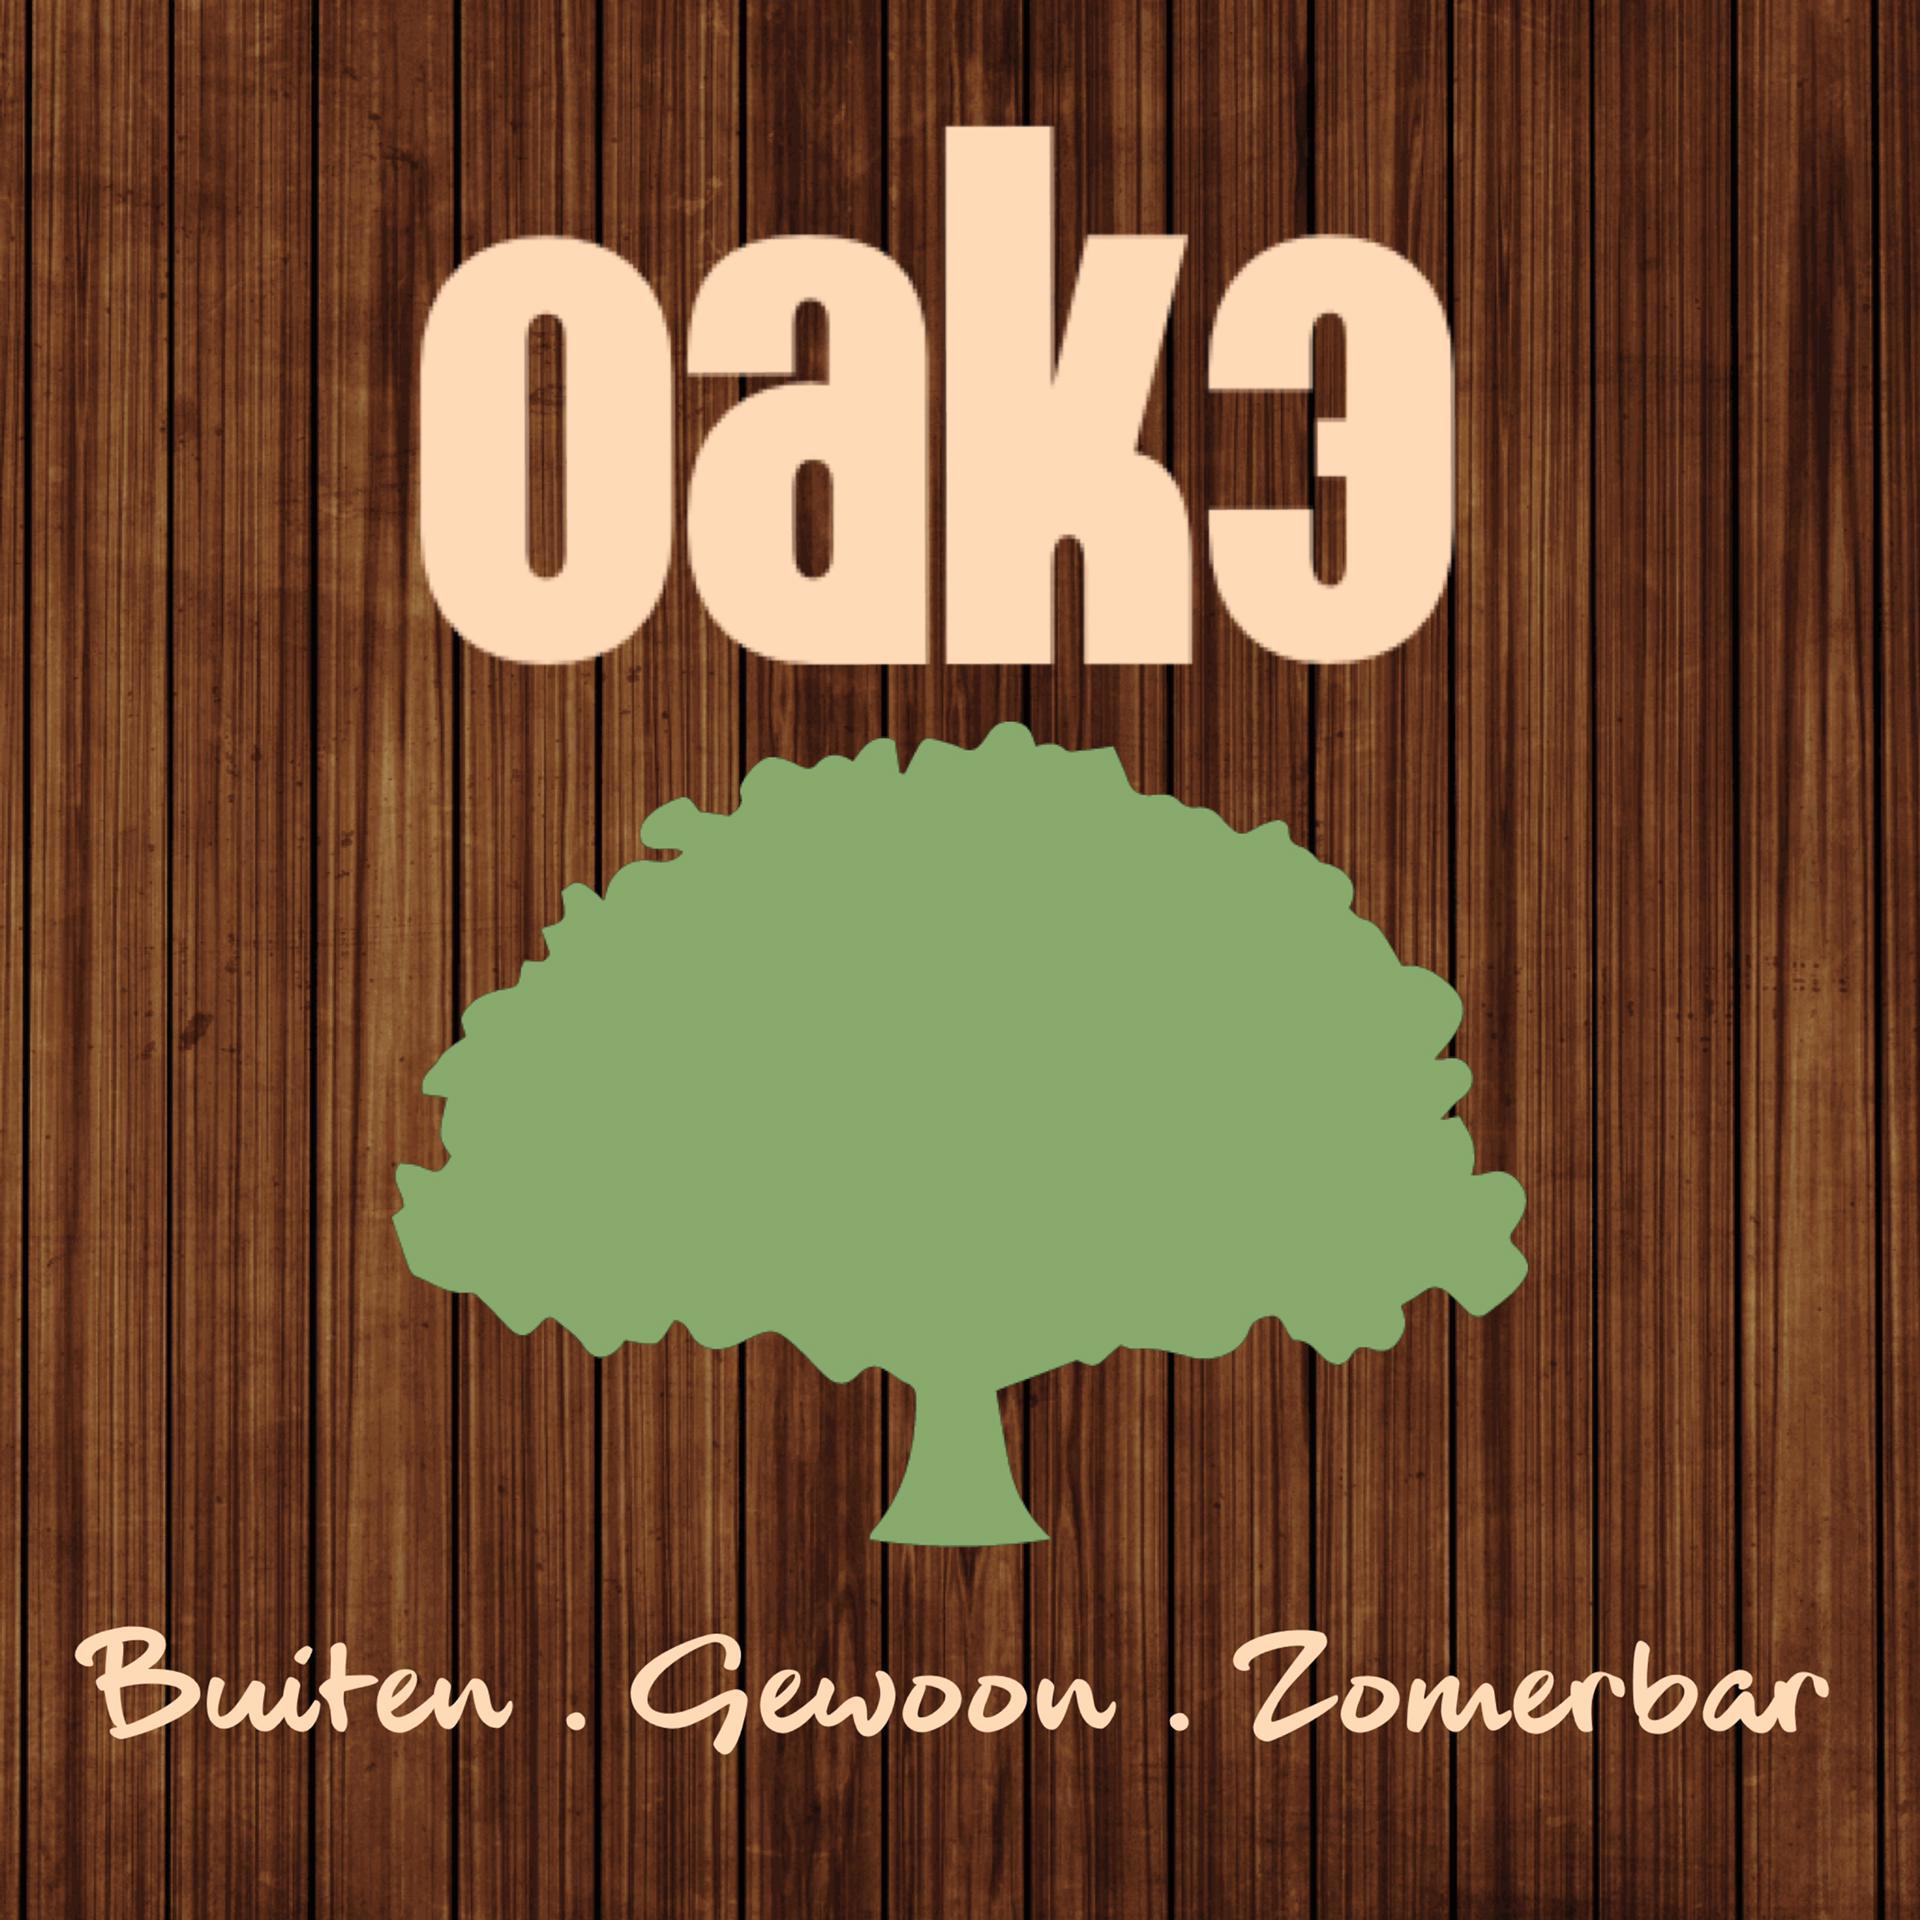 Sfeerbeeld Oak3